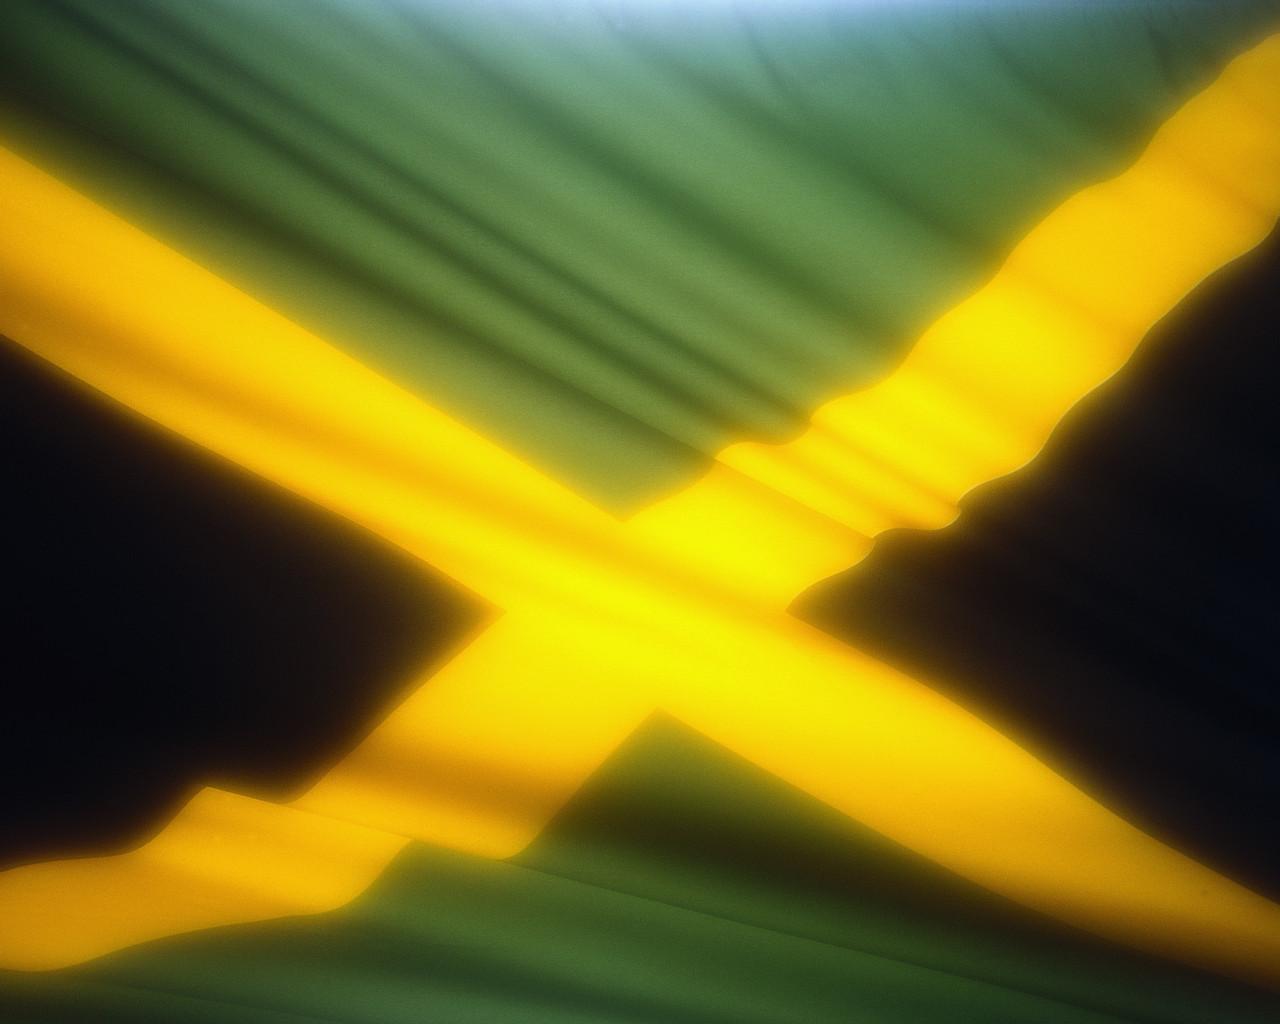 jamaicai sör